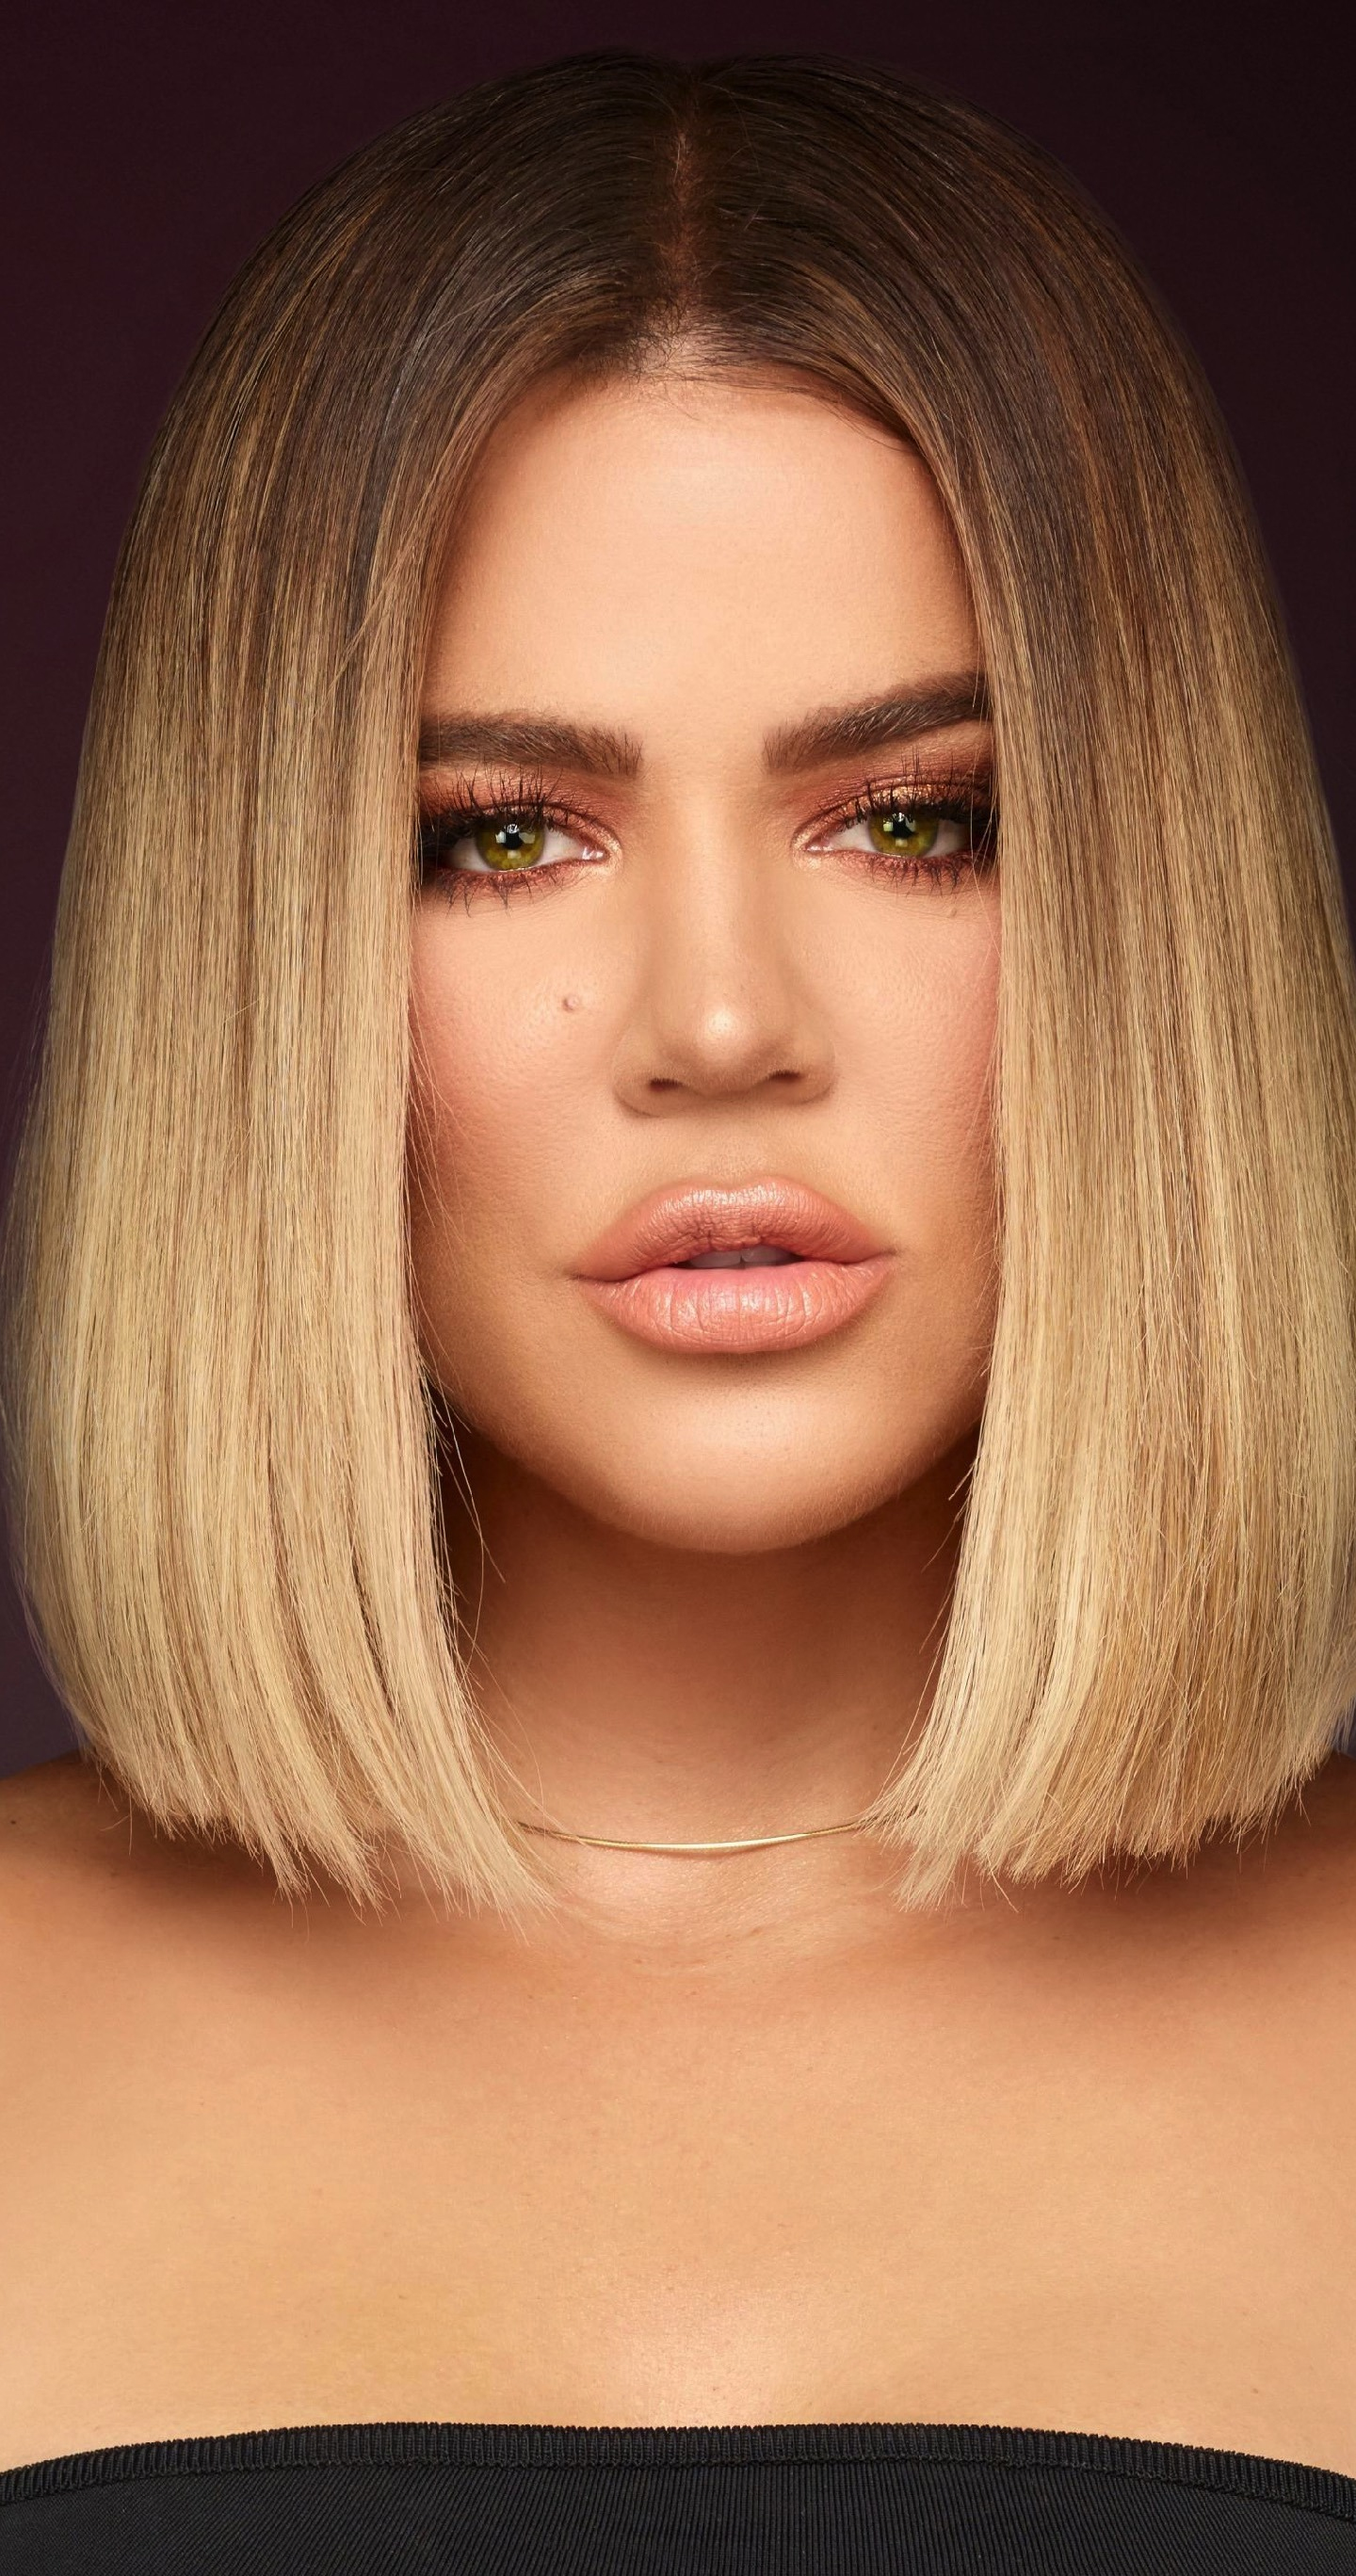 Khloe Kardashian Keeping Up With The Kardashians Tv Personality Series 1440x2960